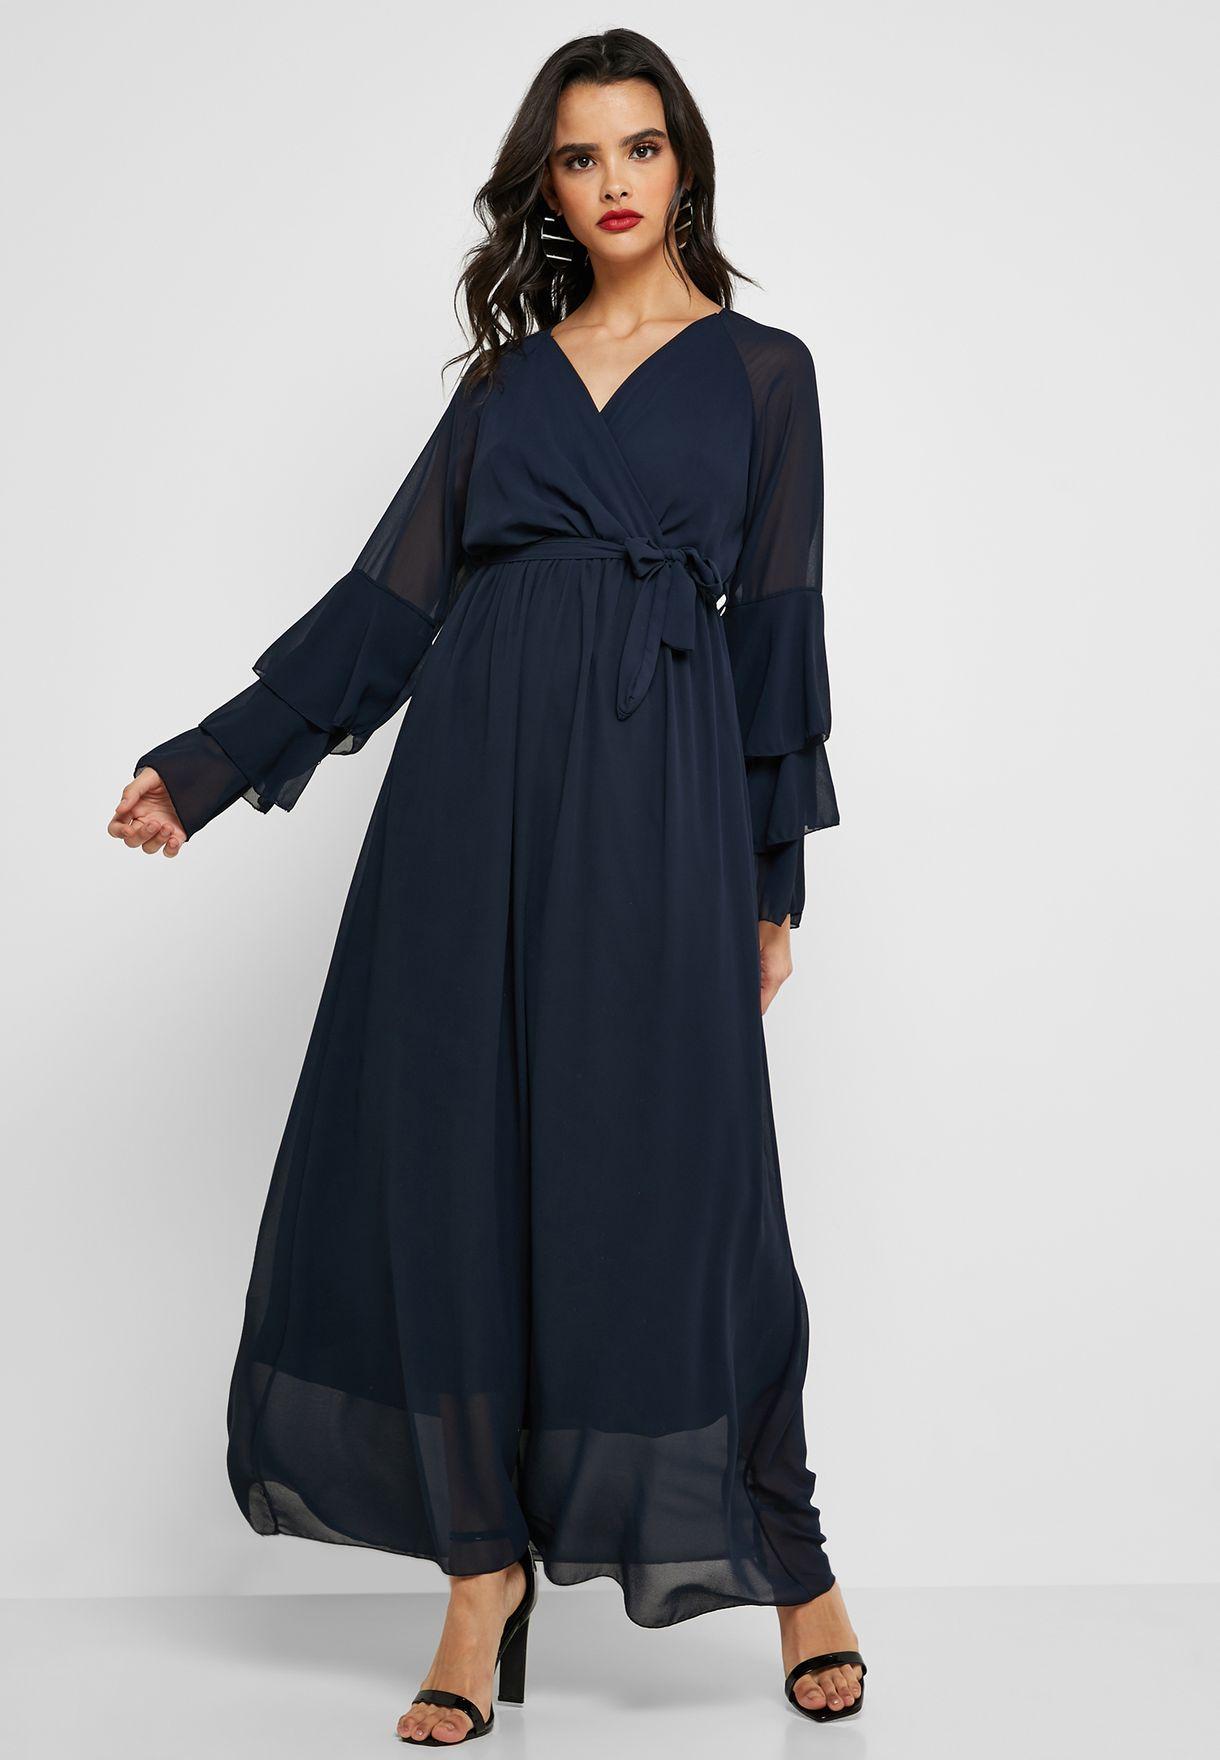 Layered Sleeves Wrap Dress